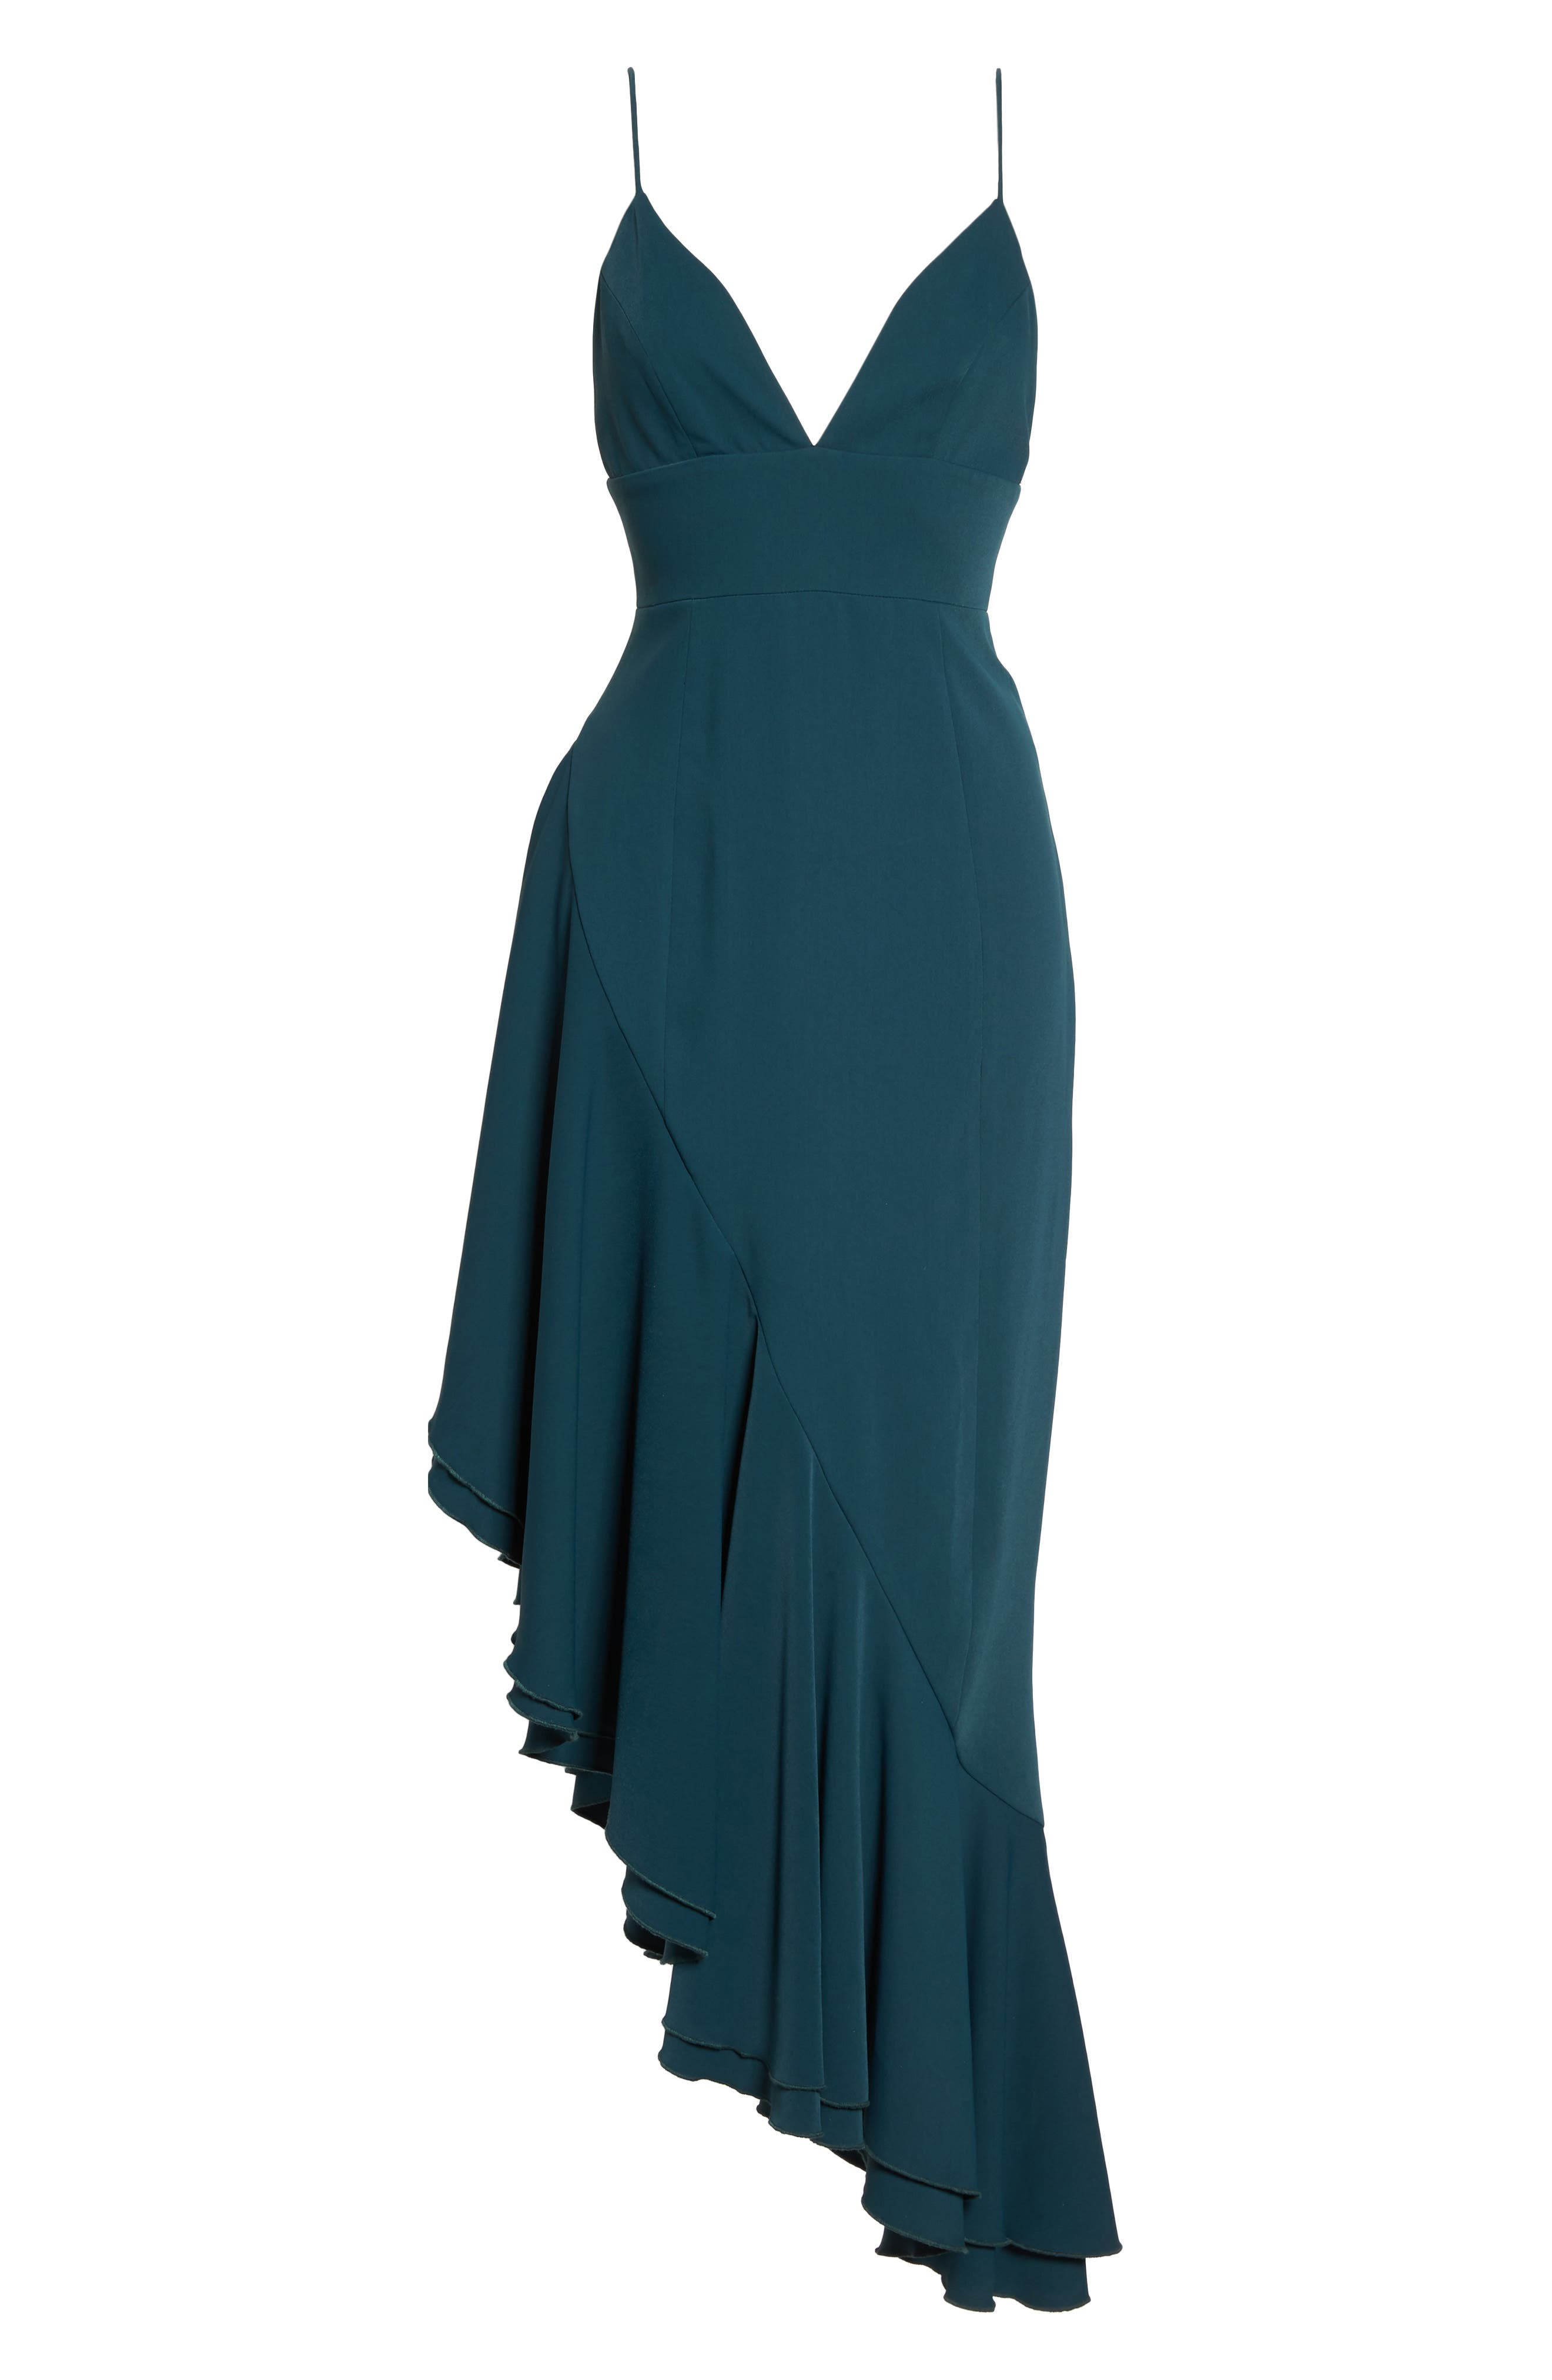 Temptation Asymmetrical Gown,                             Alternate thumbnail 7, color,                             Emerald